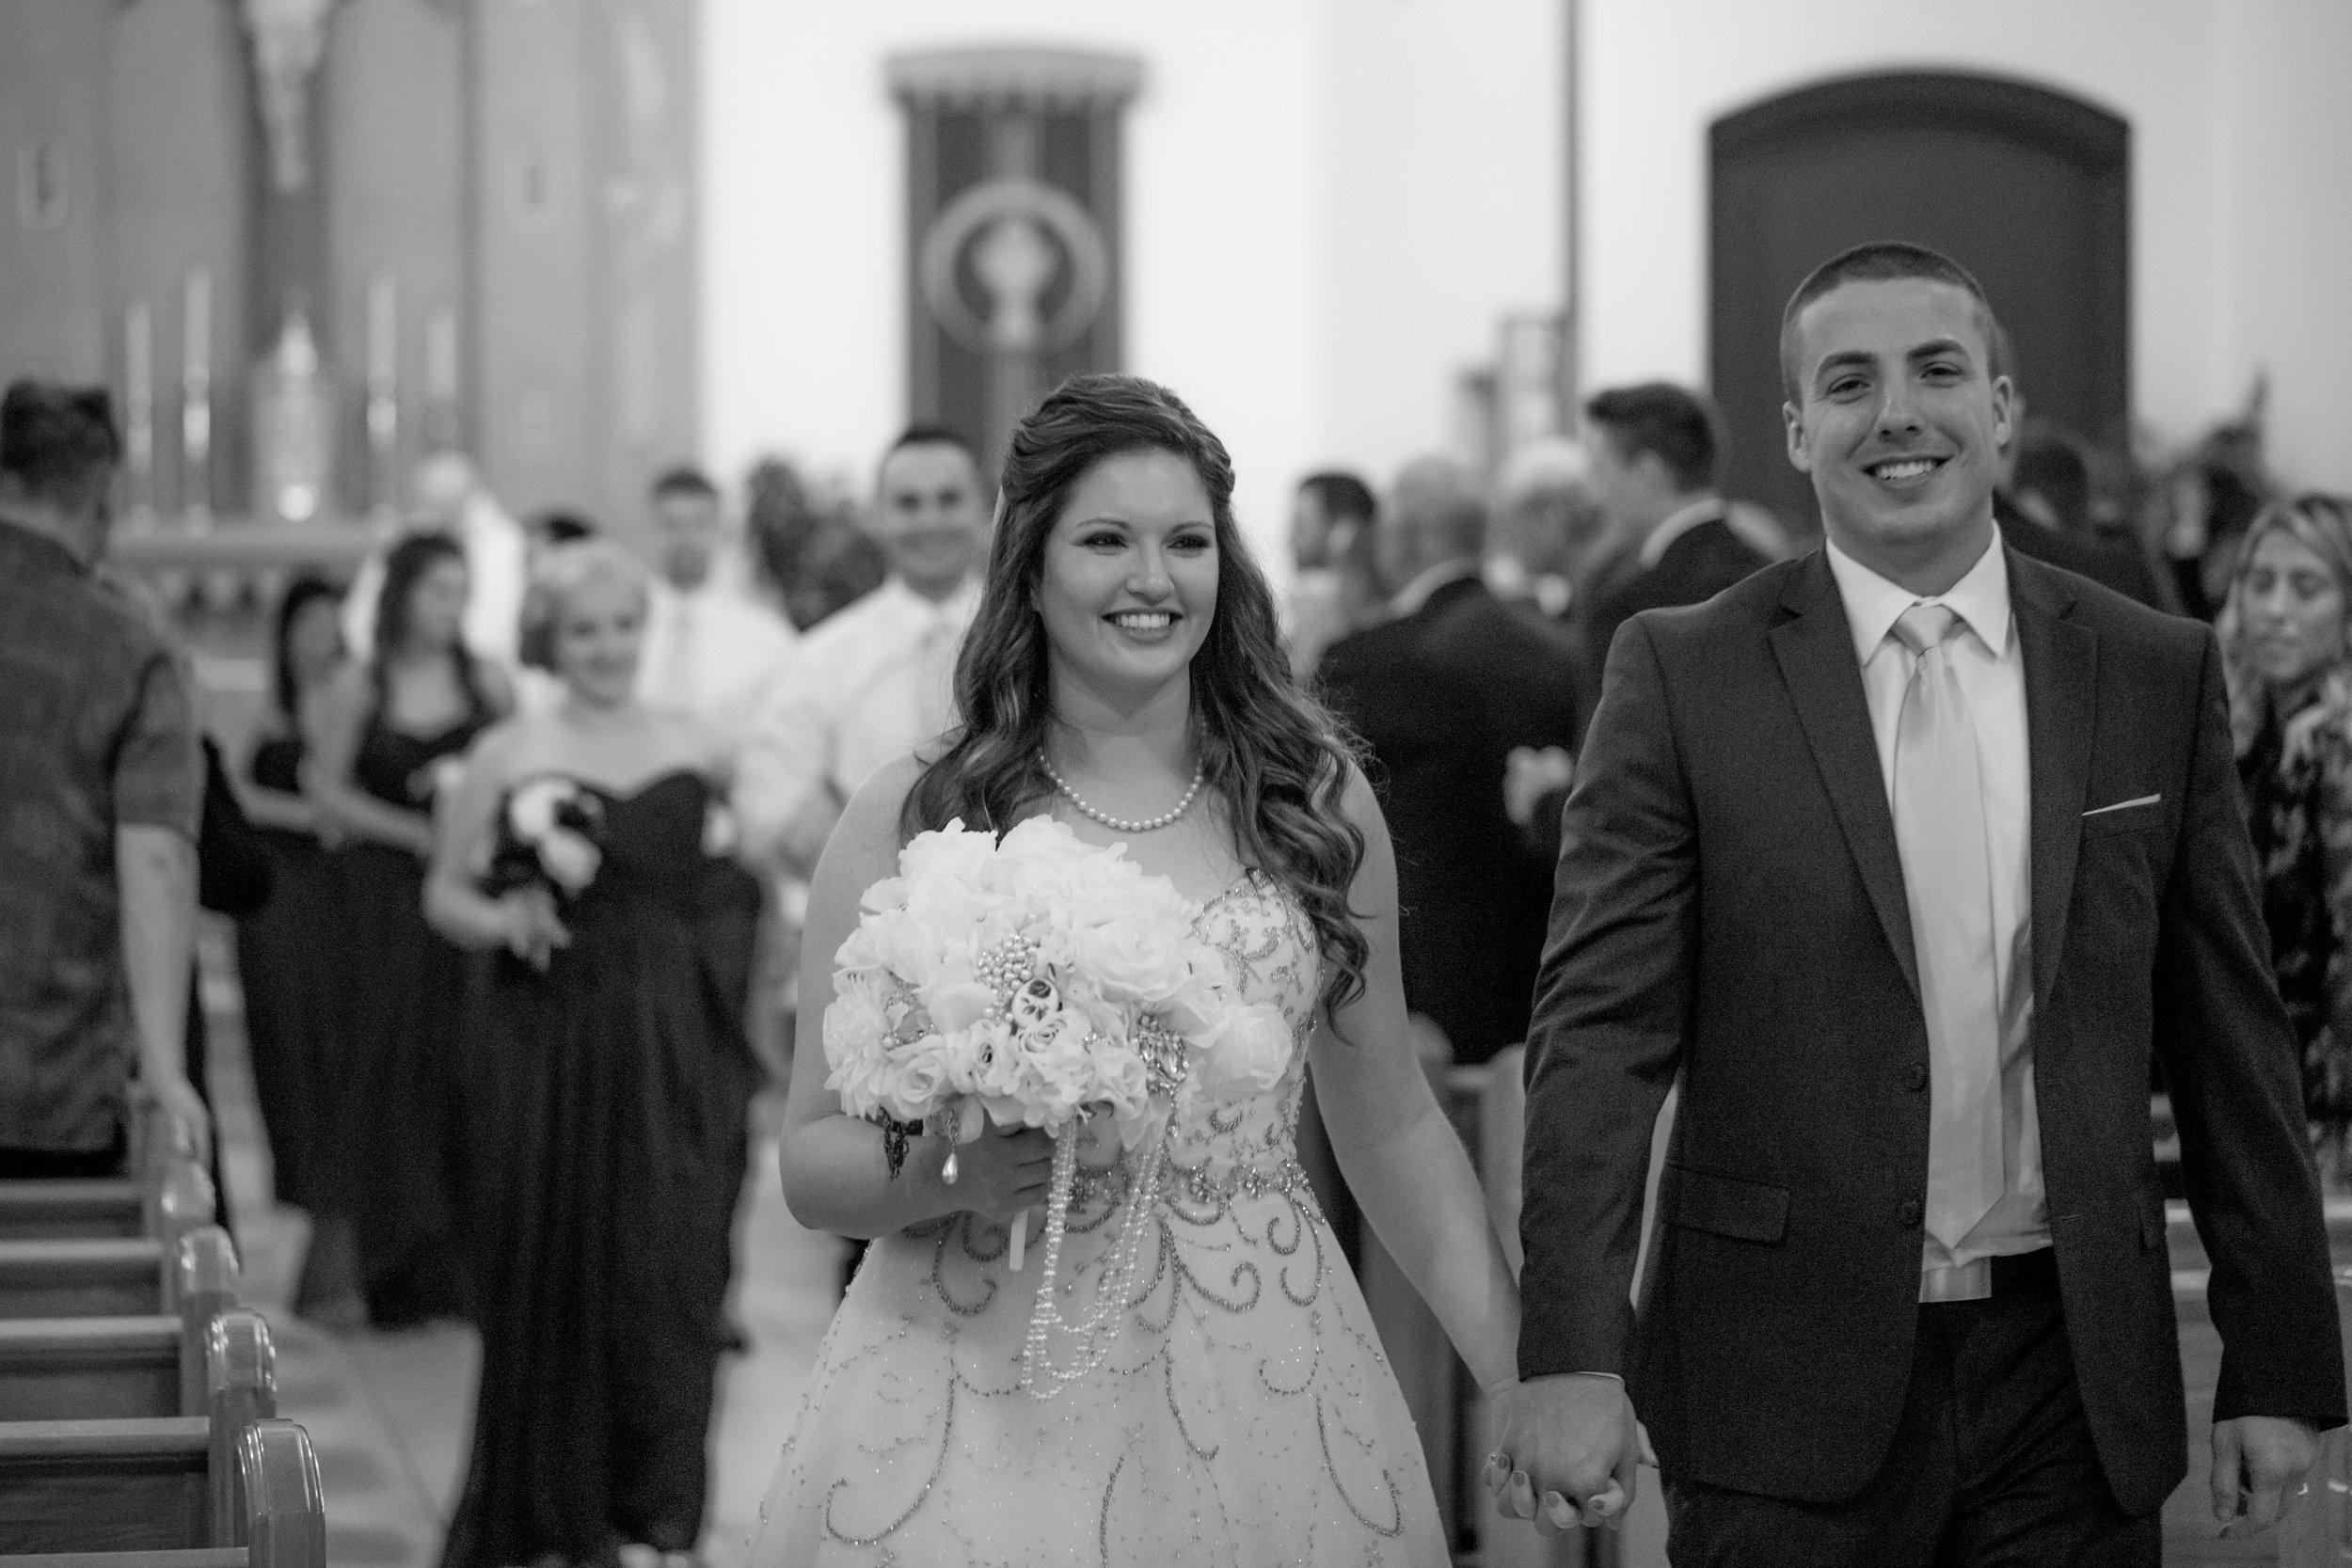 Introducing: Mr. & Mrs. Risoli